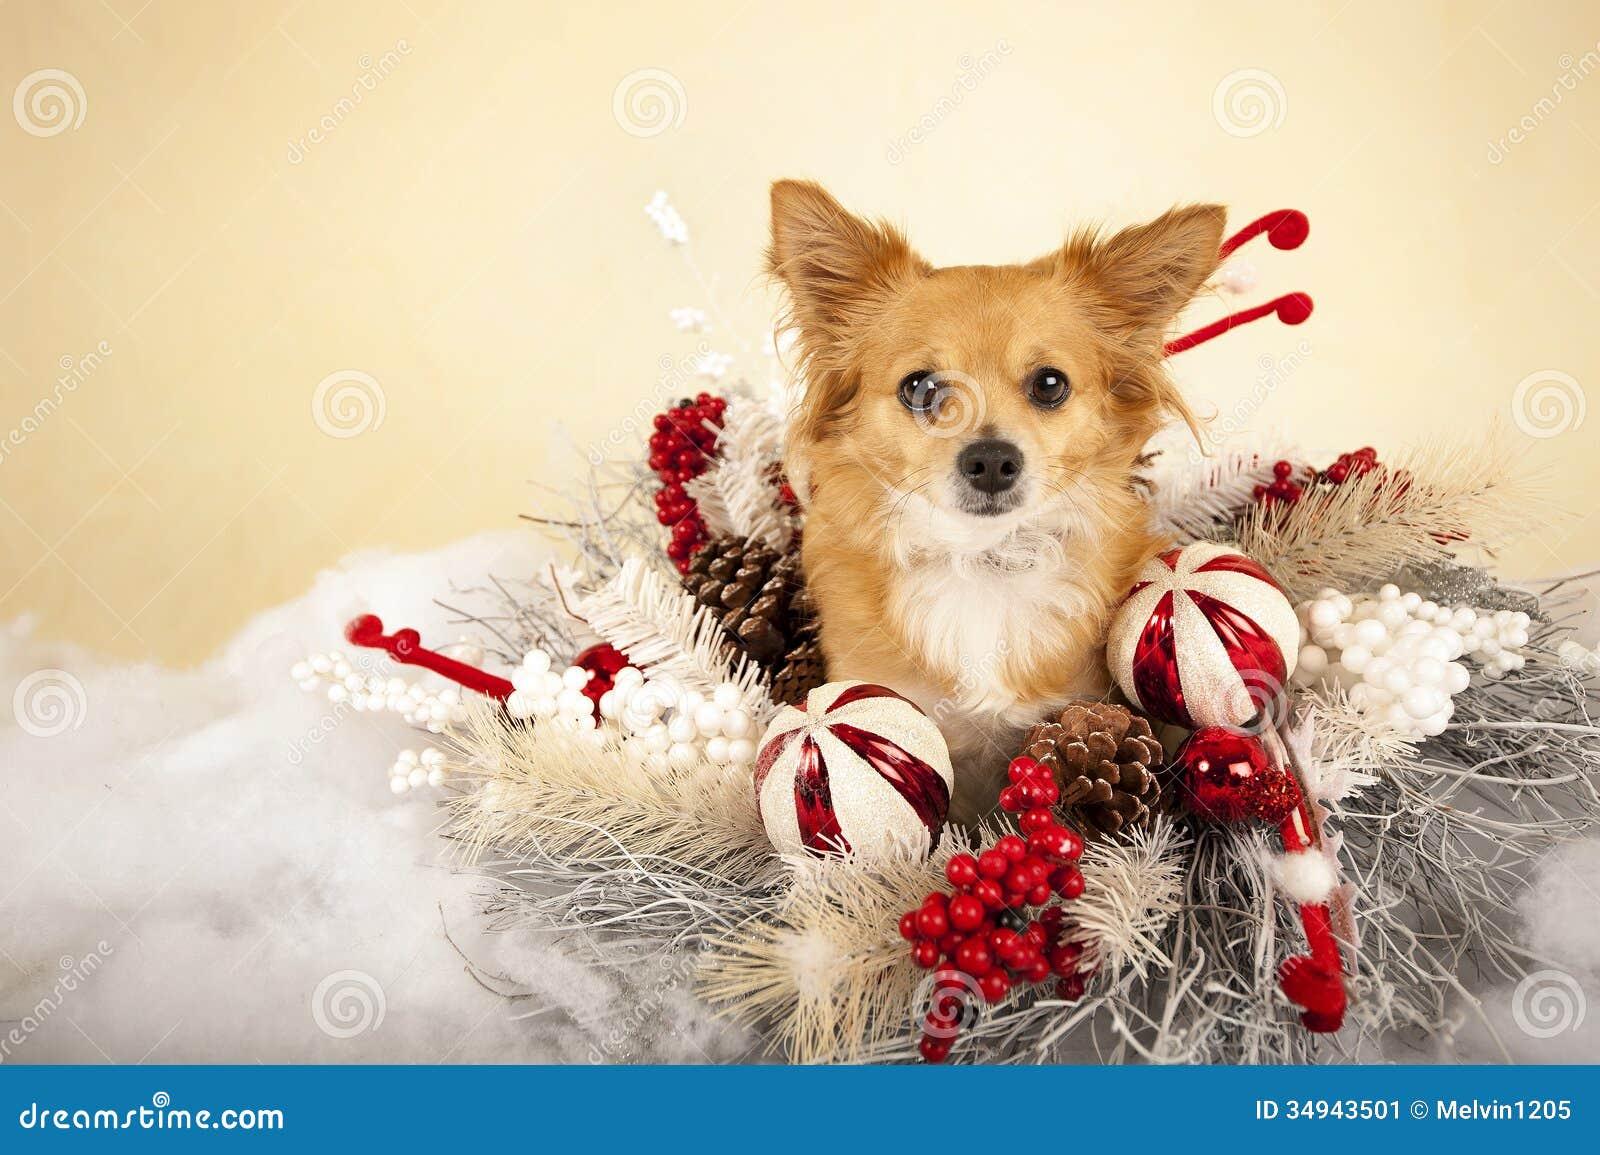 Christmas Wreath Ideas Christmas Dog Stock Image Image 34943501